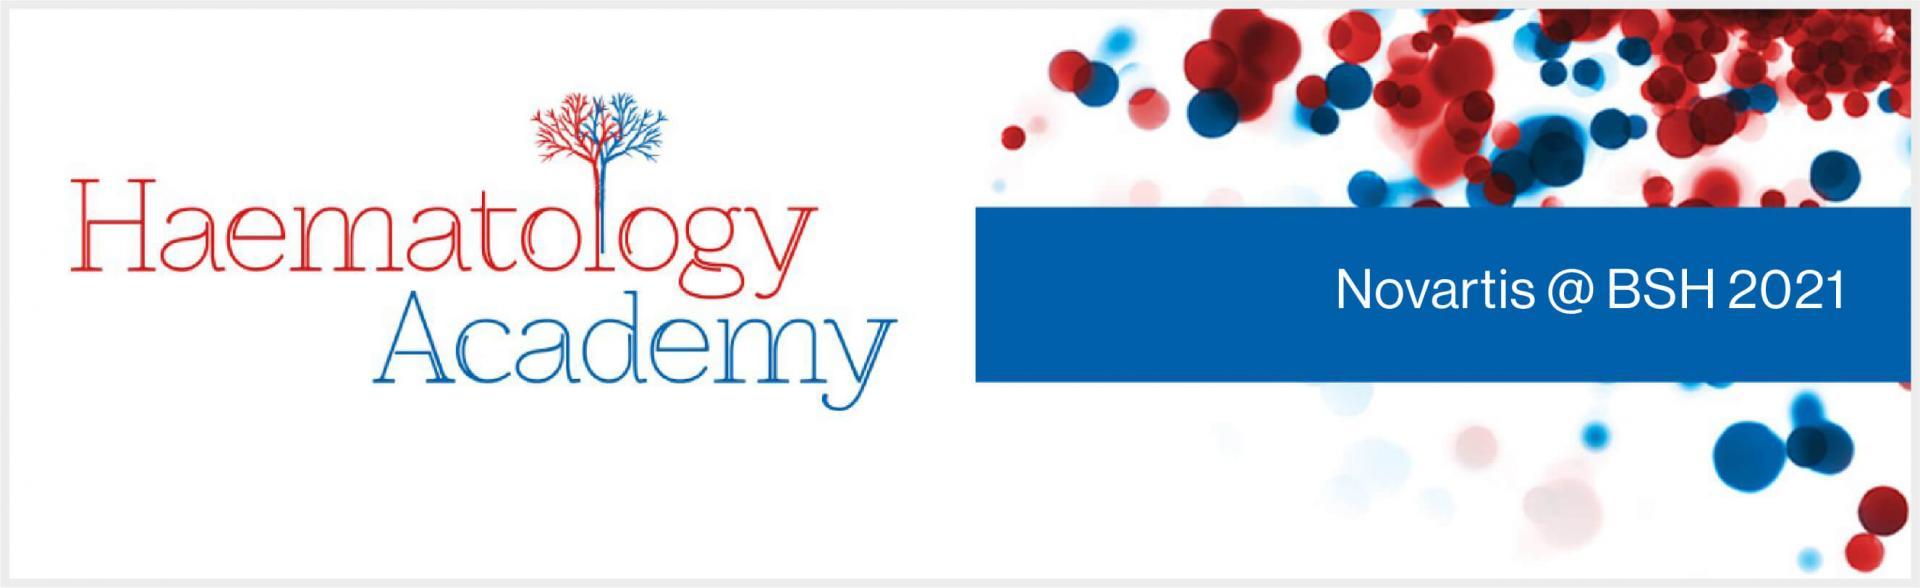 Top banner. Haematology Academy. Novartis @ BSH 2021 British Society for Haematology – Symposium recordings